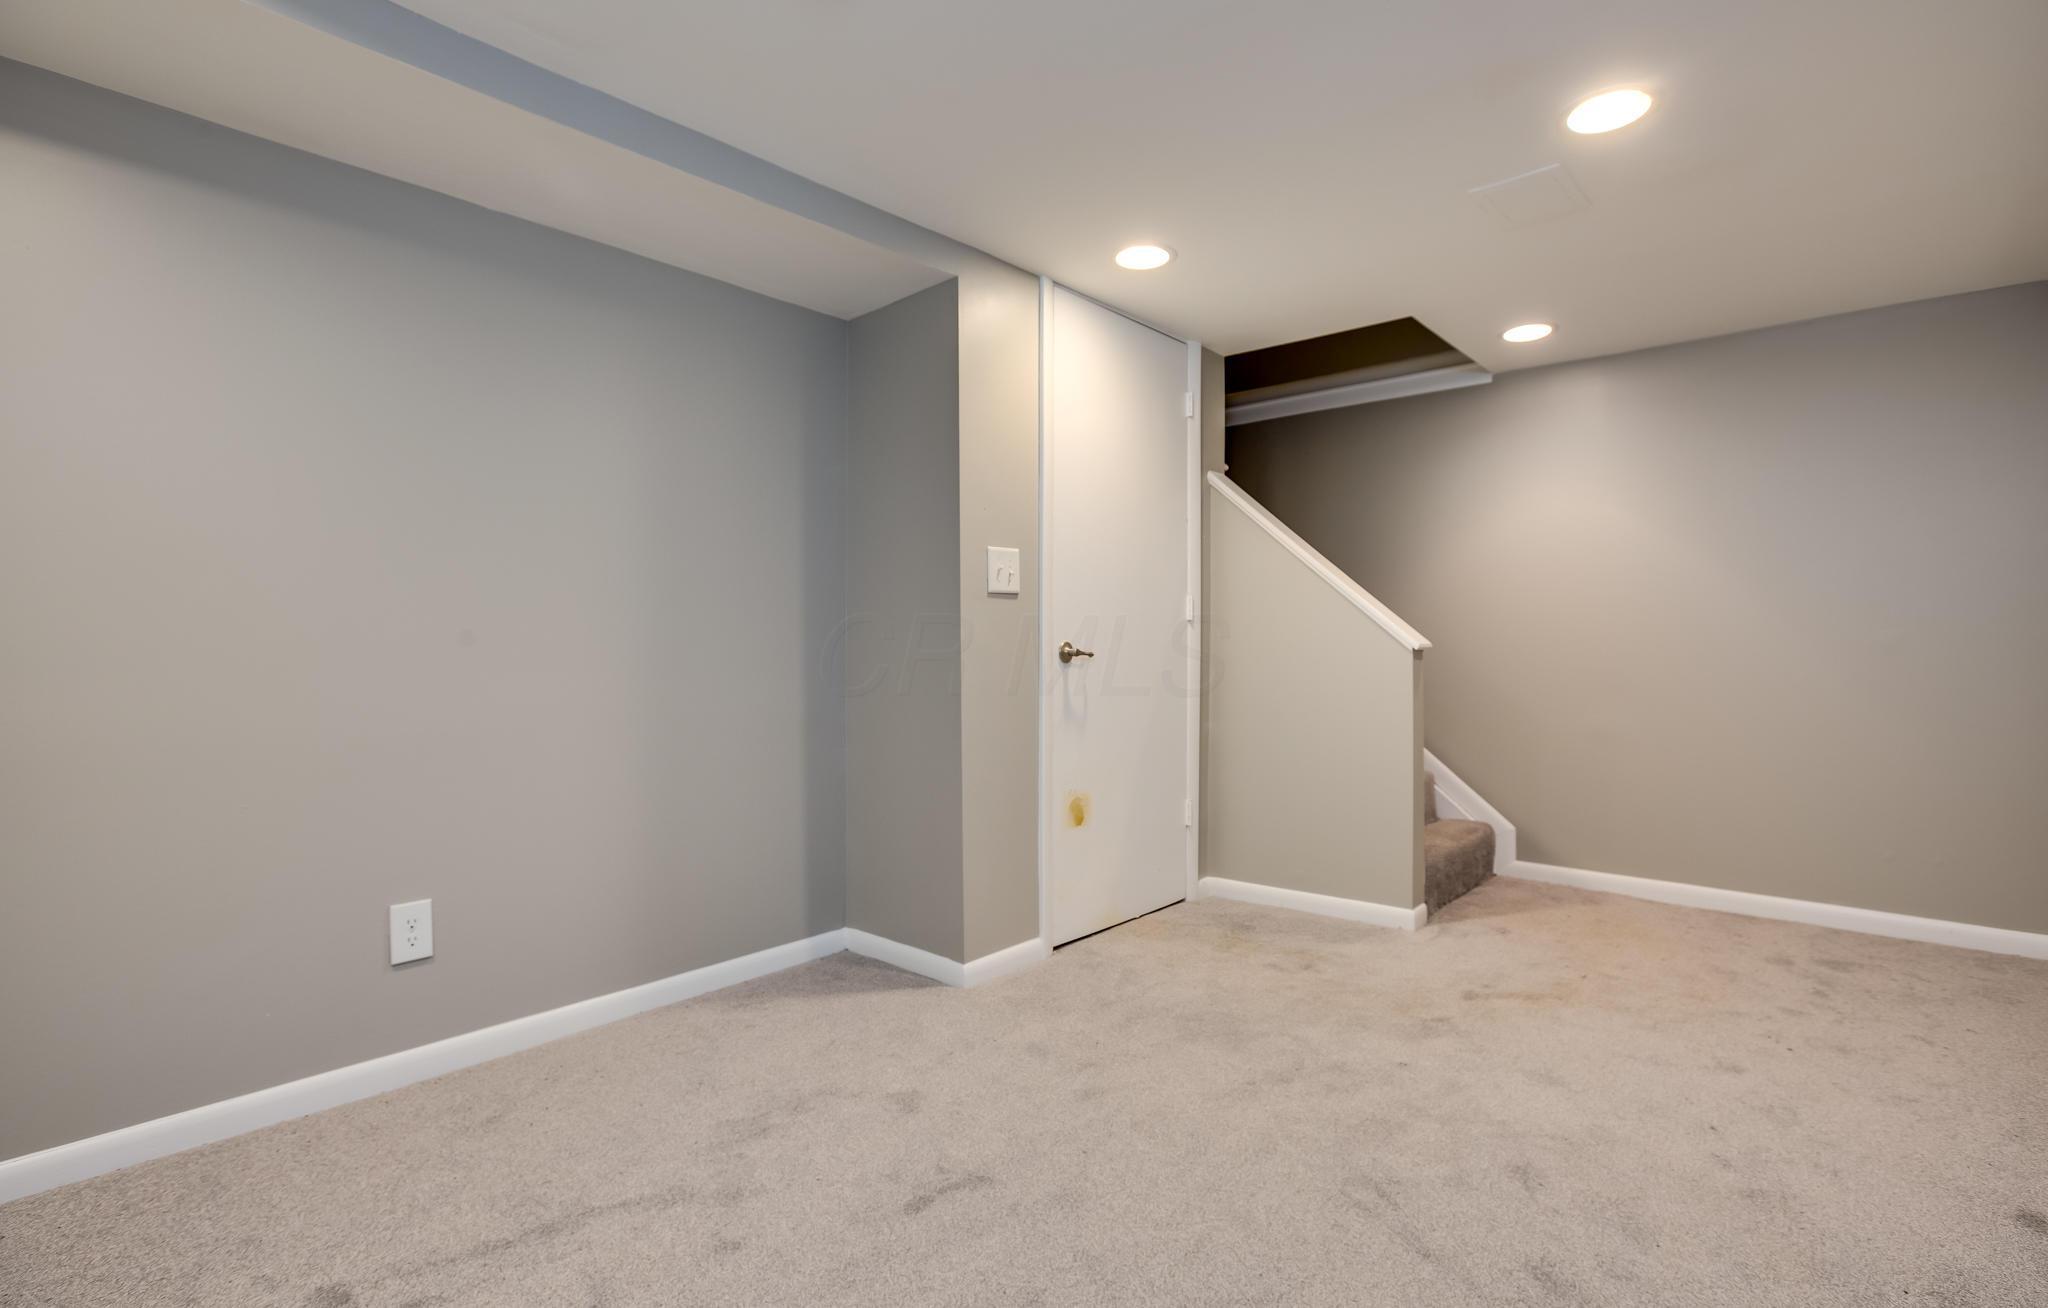 2605 Scioto View Lane, Columbus, Ohio 43221, 2 Bedrooms Bedrooms, ,2 BathroomsBathrooms,Residential,For Sale,Scioto View,220025433